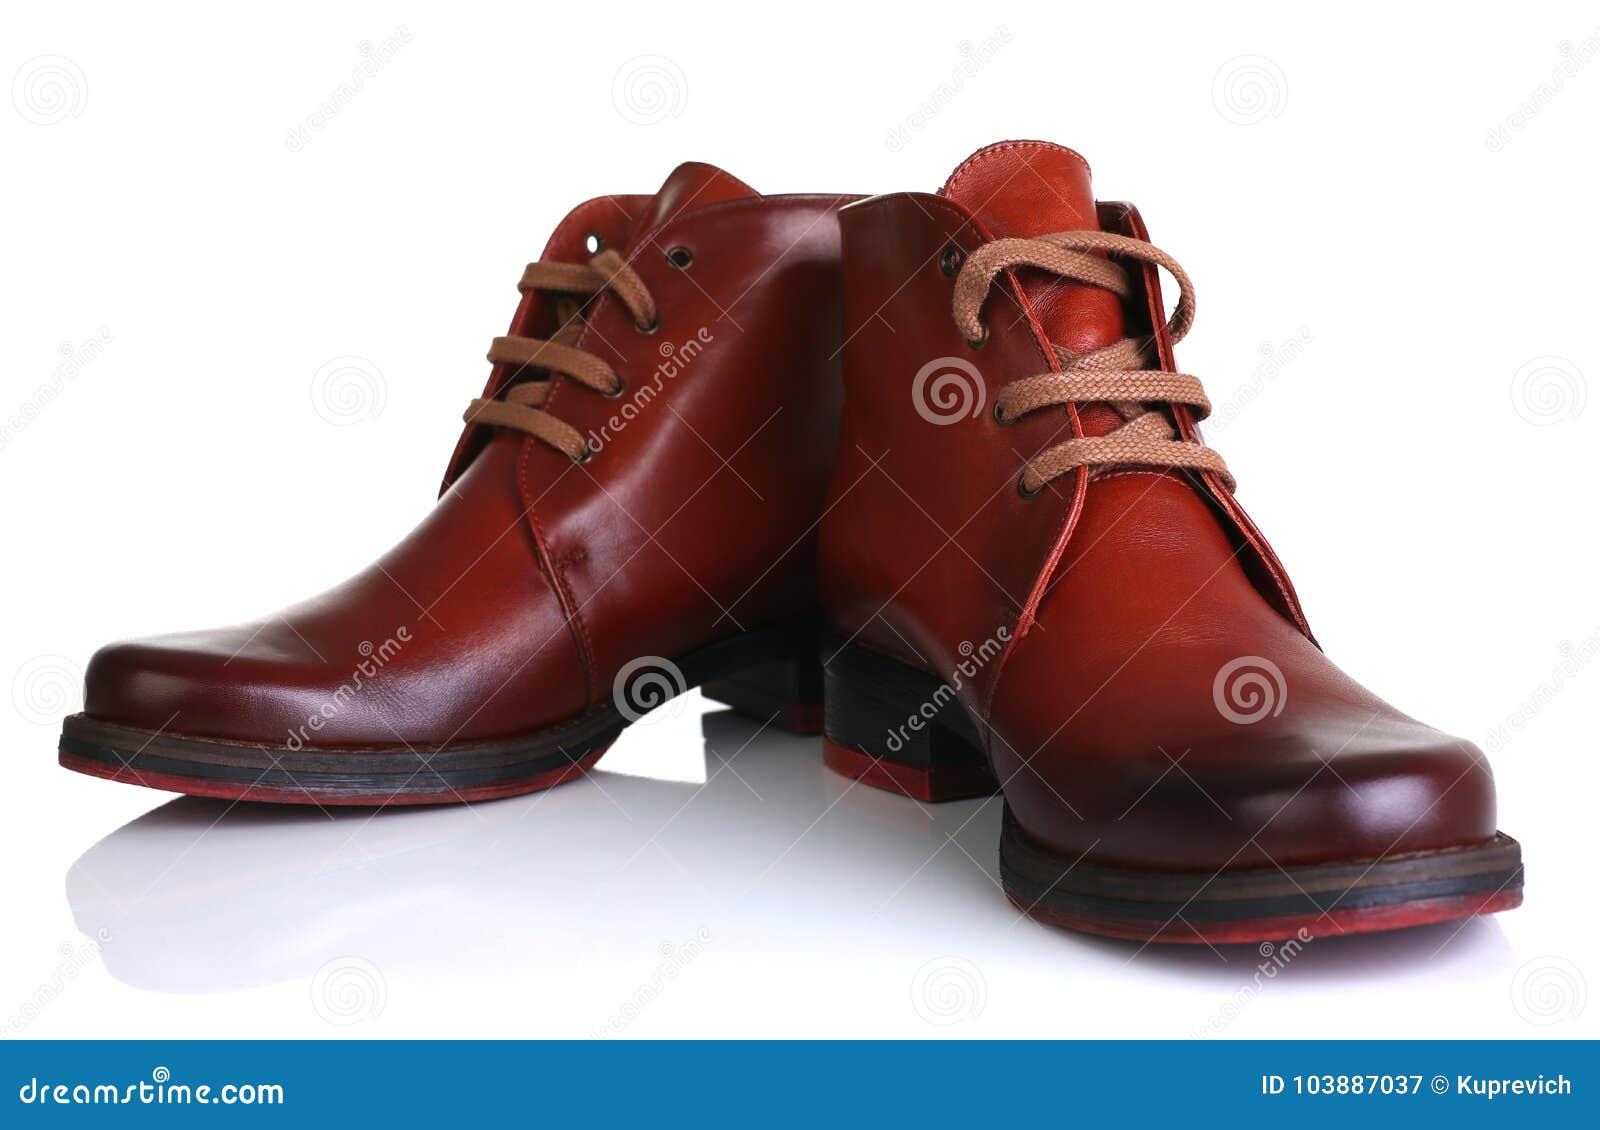 Orange red leather shoes men women unisex beauty fashion style isolated on  white background laces store stylish clothes 4cf70318d0